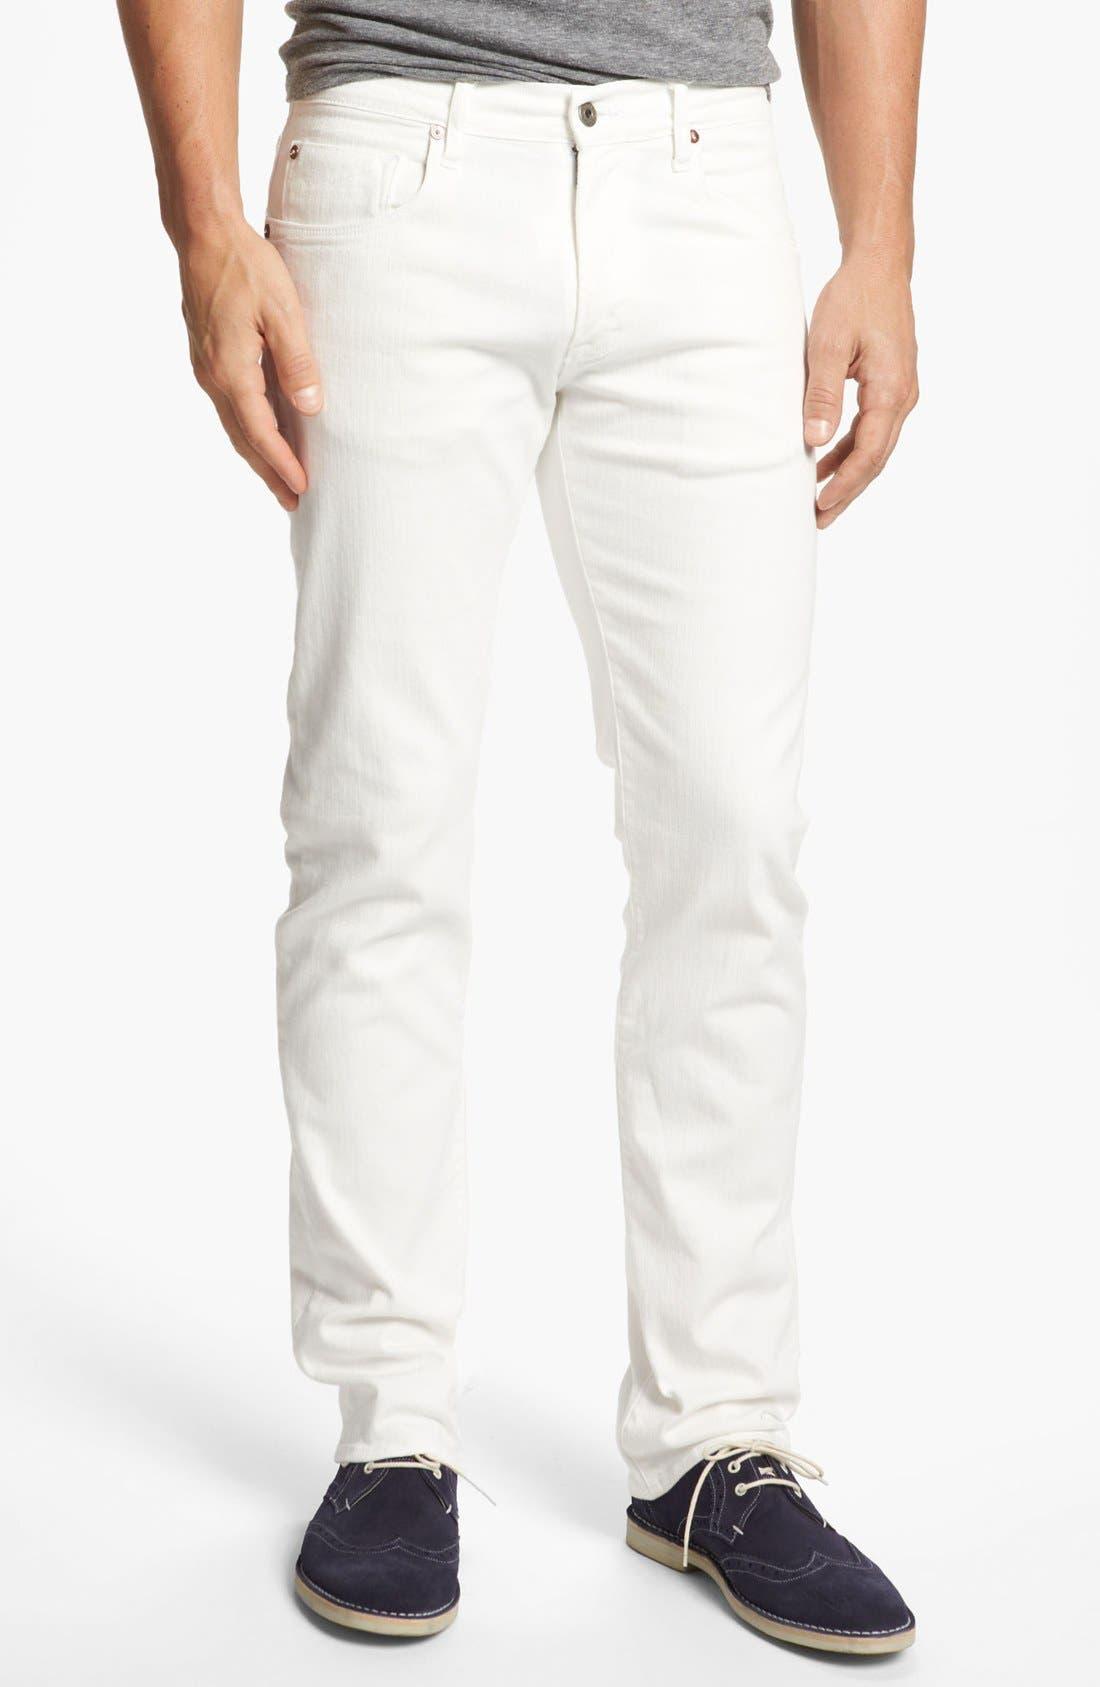 Alternate Image 1 Selected - Façonnable Tailored Denim Straight Leg Jeans